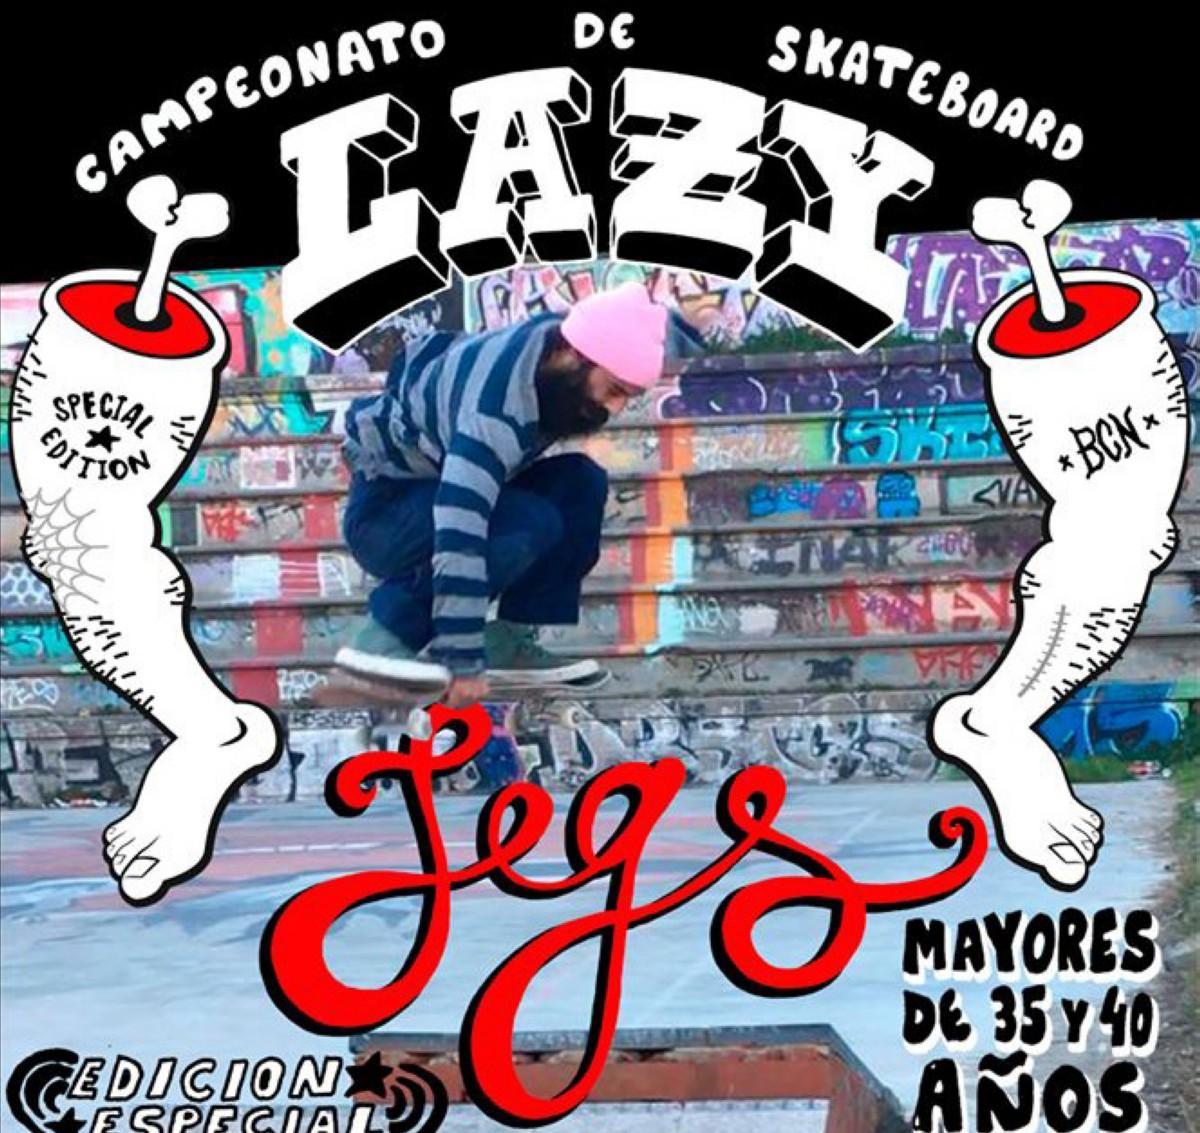 Lazy Legs edición especial Barcelona